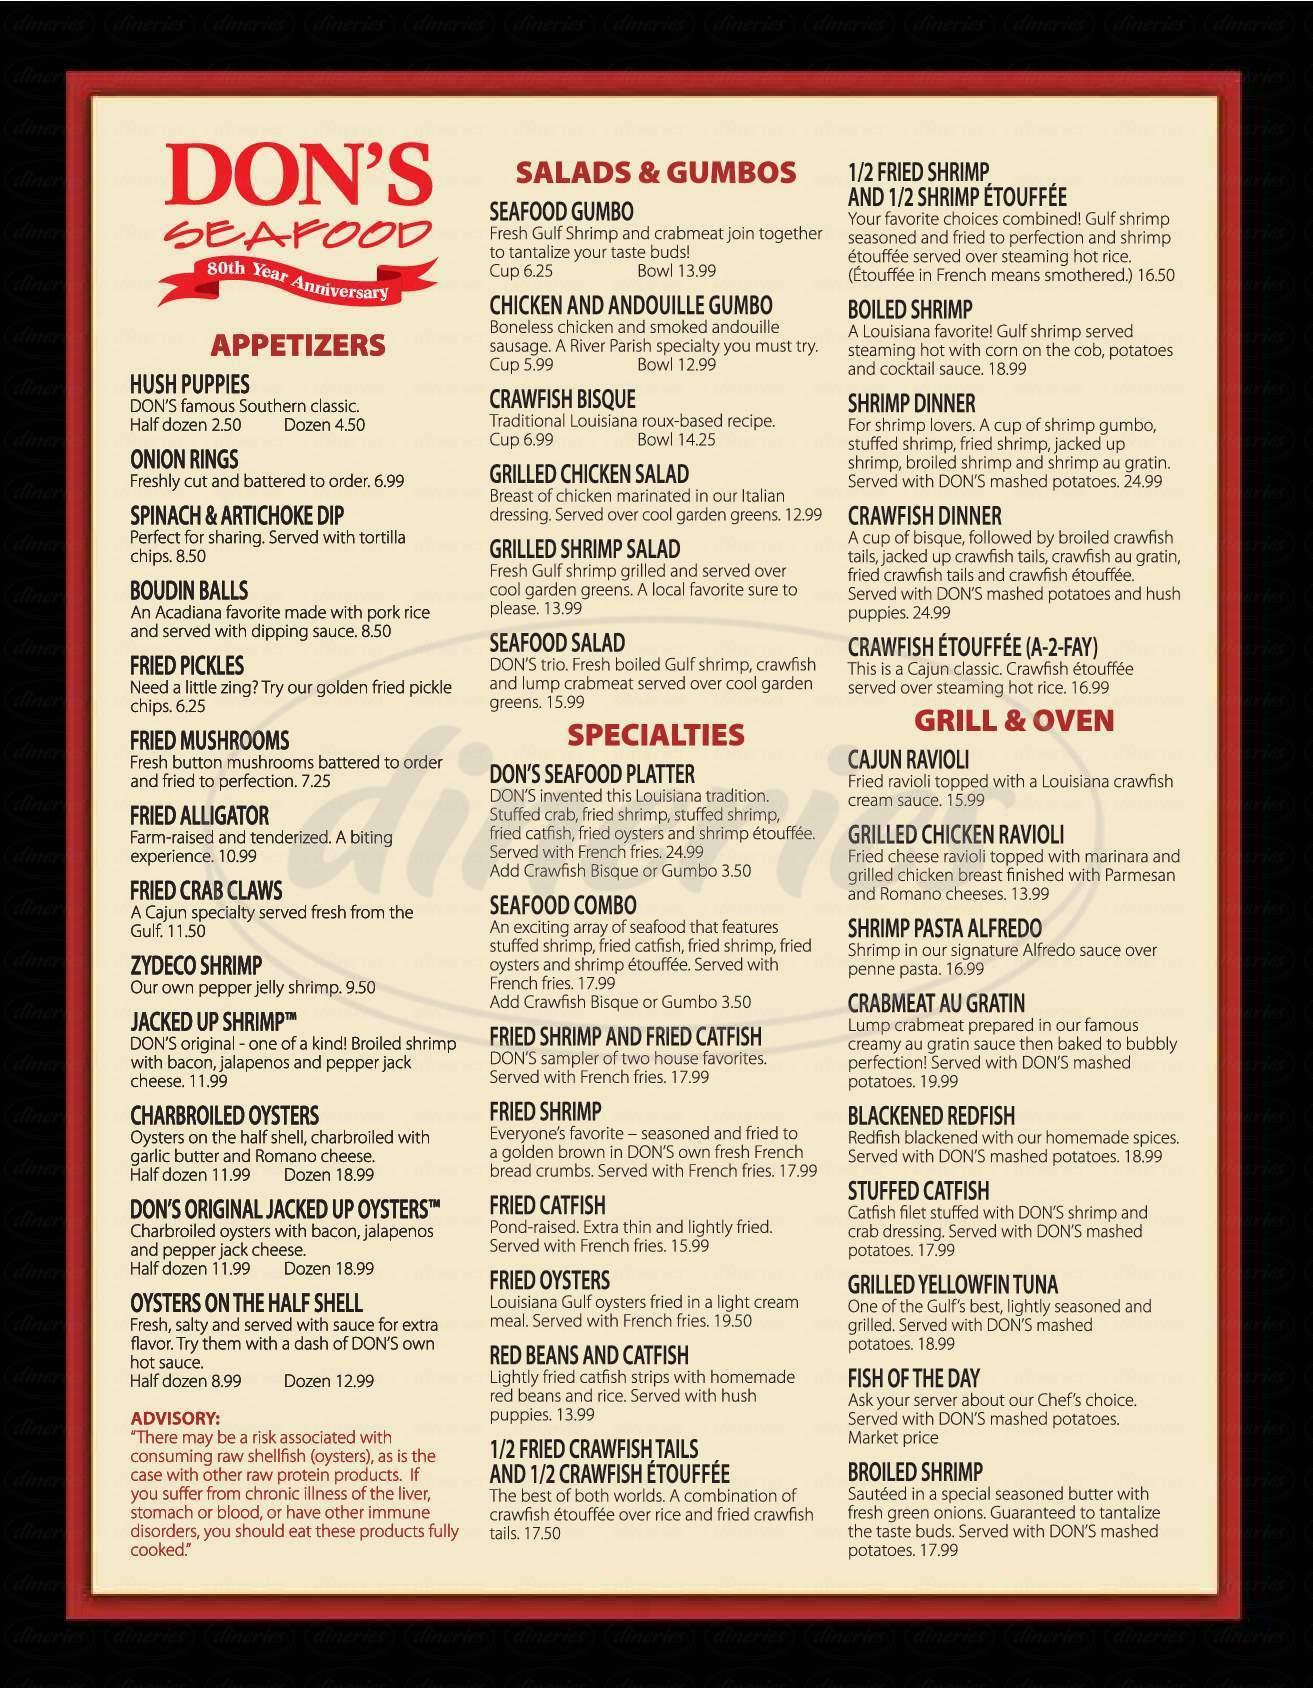 menu for Dons Seafood Hut